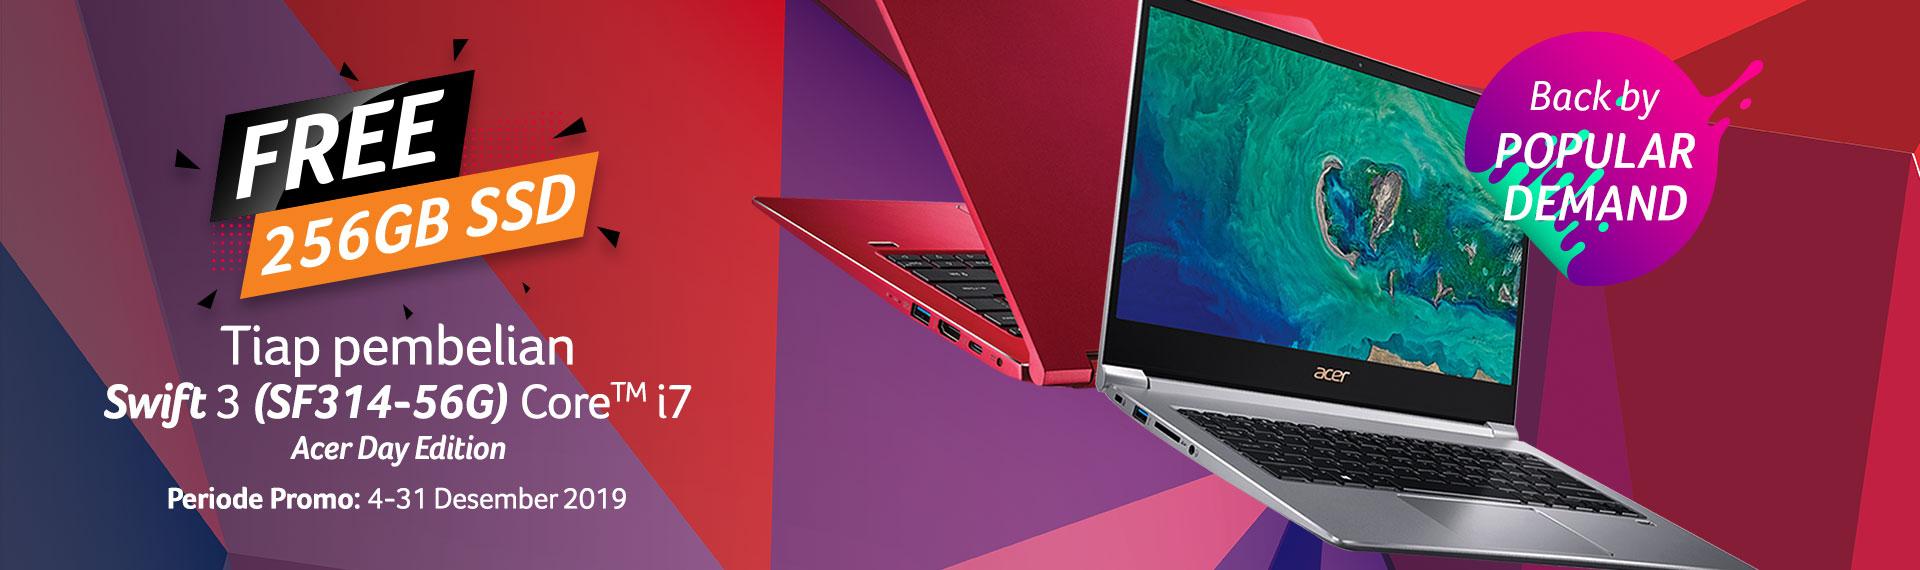 Beli Laptop Swift 3 Acer Day Edition, Dapatkan Bonus SSD 256GB